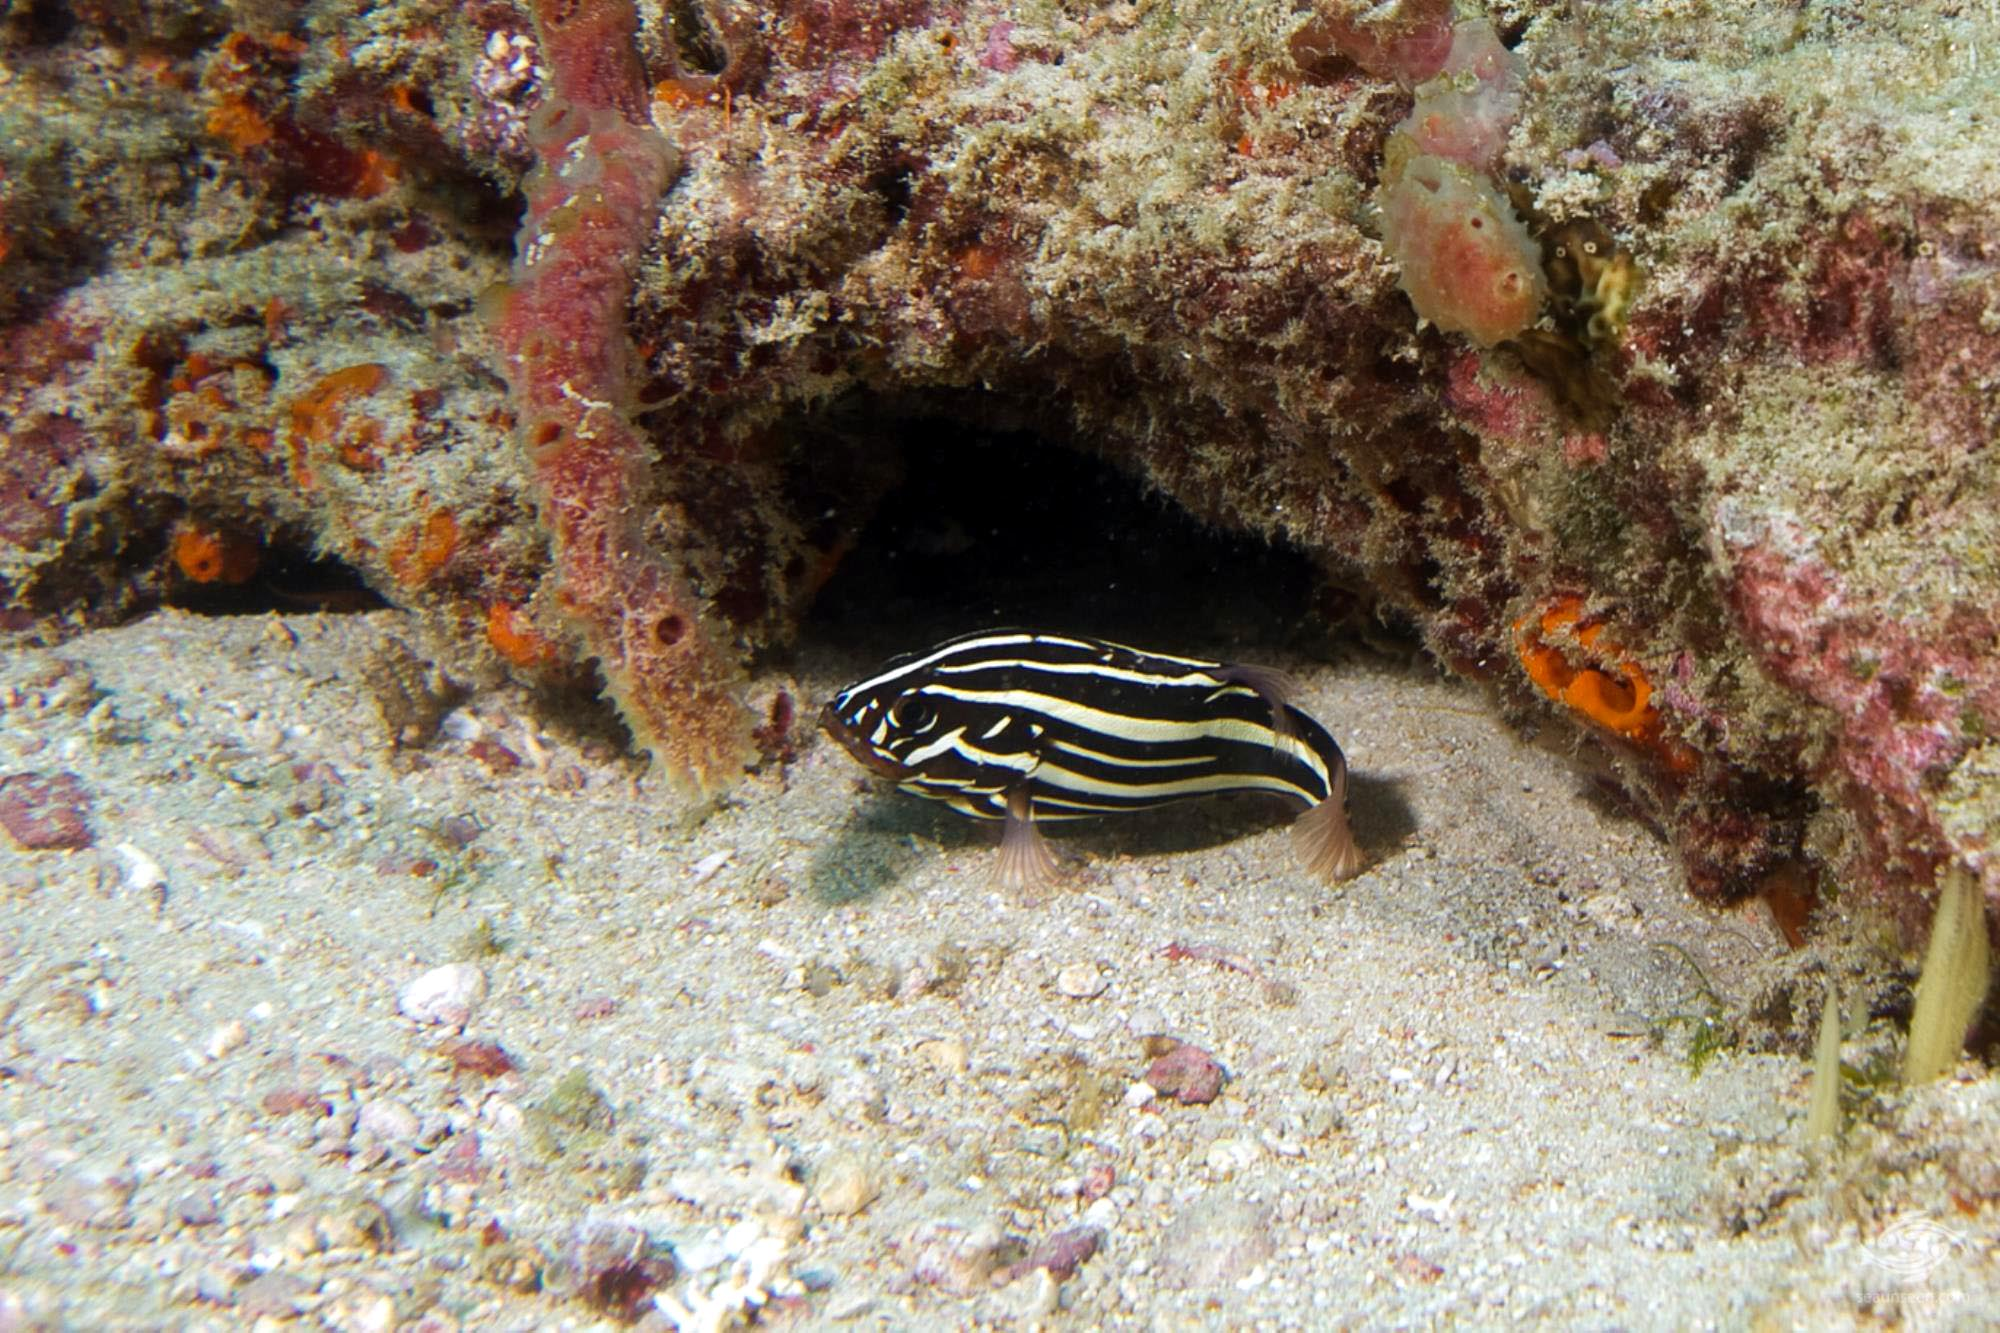 six-lined soapfish (Grammistes sexlineatus)